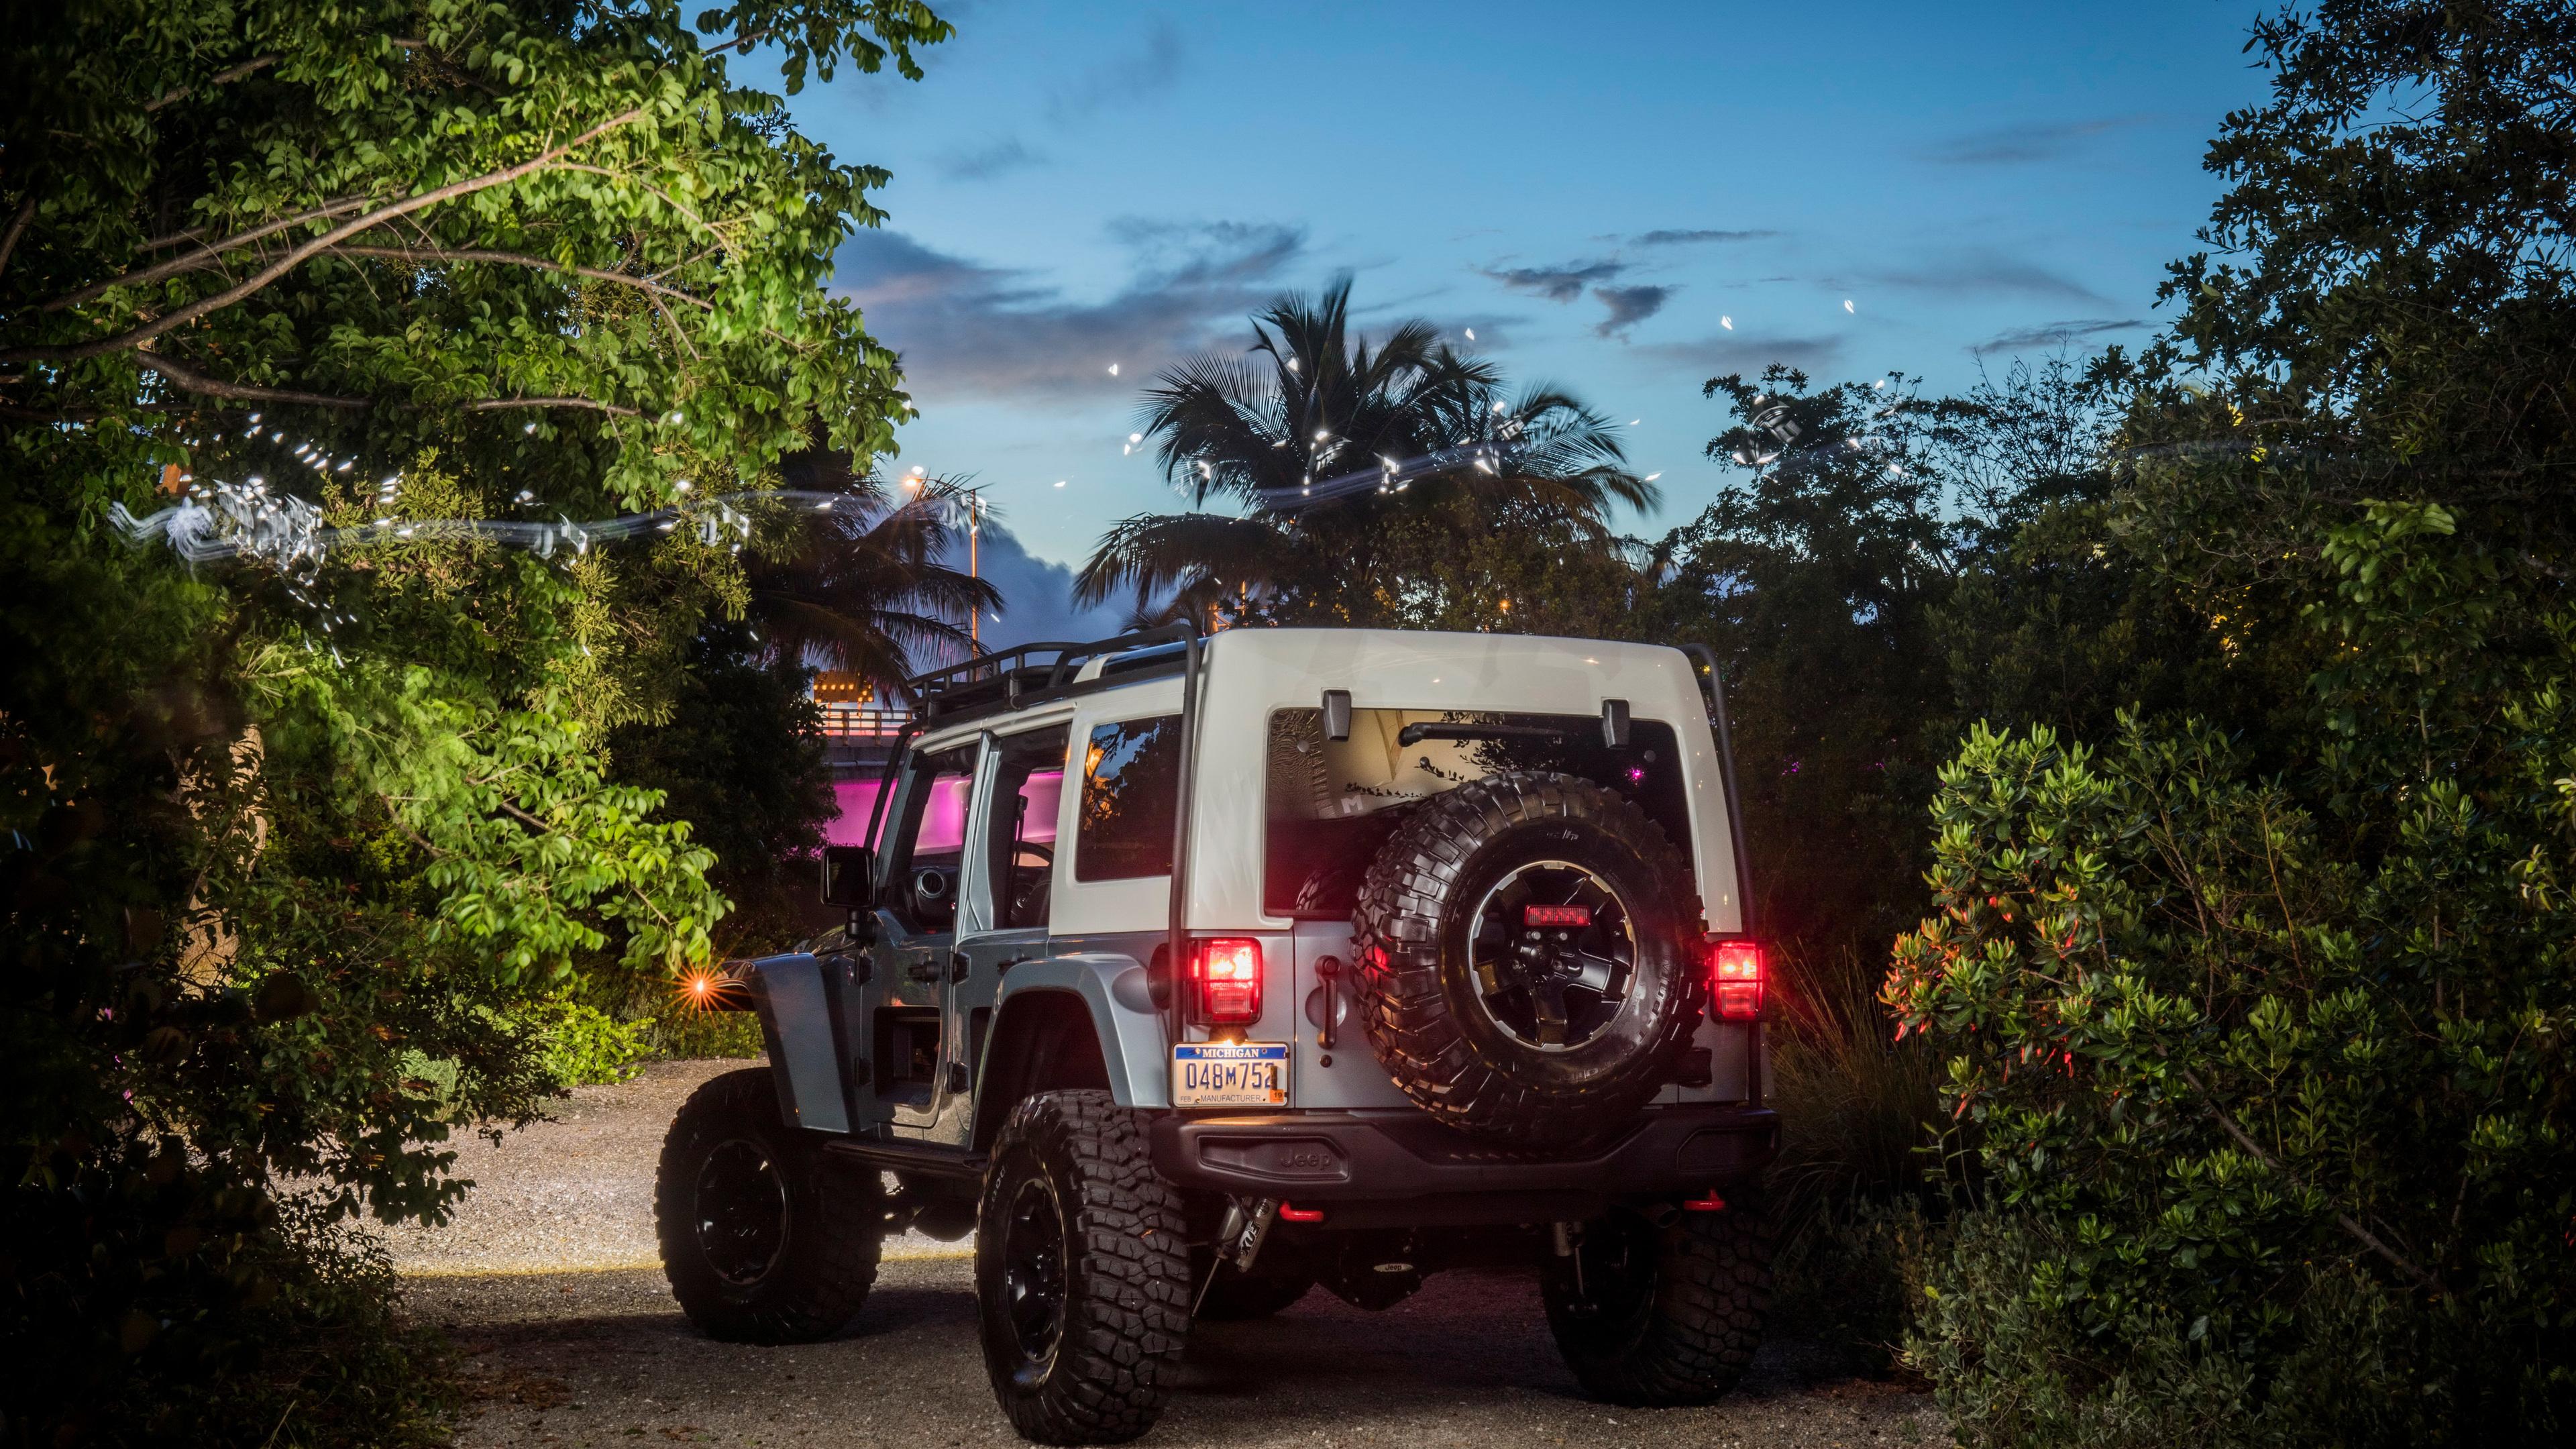 jeep switchback concept rear 1539109427 - Jeep Switchback Concept Rear - jeep wallpapers, jeep switchback wallpapers, hd-wallpapers, concept cars wallpapers, cars wallpapers, 4k-wallpapers